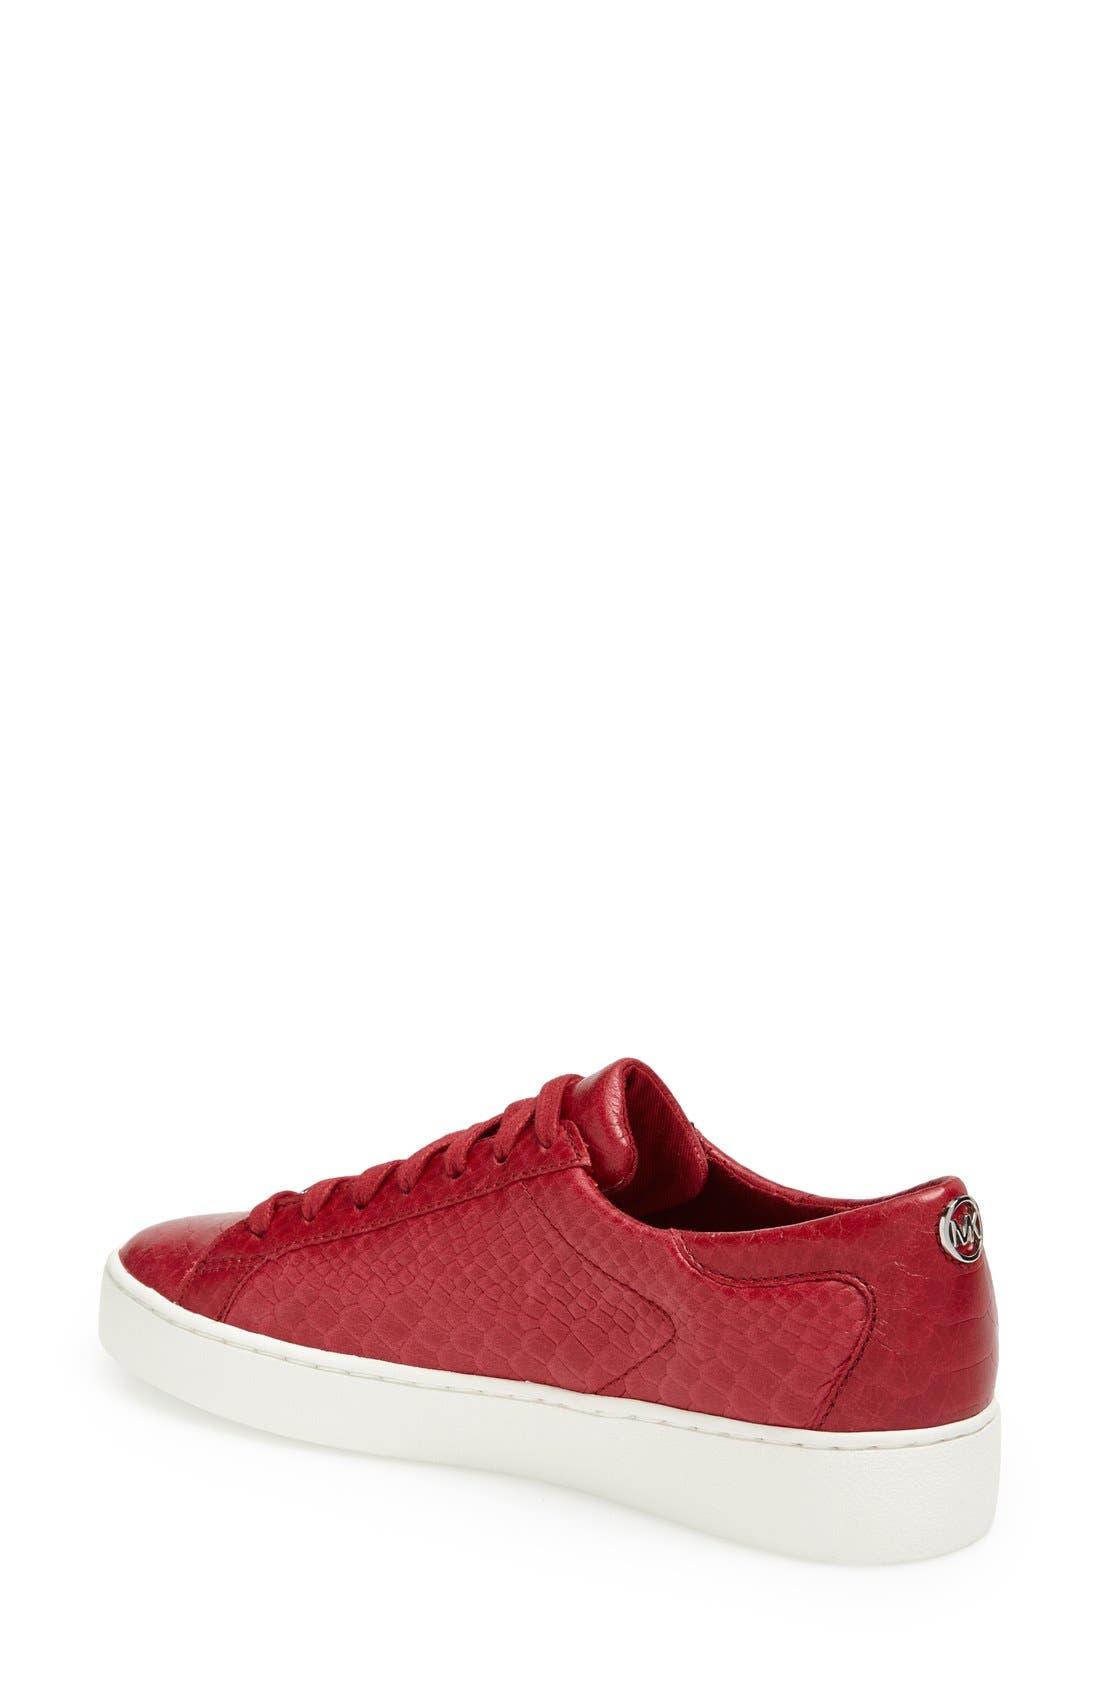 'Keaton' Sneaker,                             Alternate thumbnail 2, color,                             Scarlet